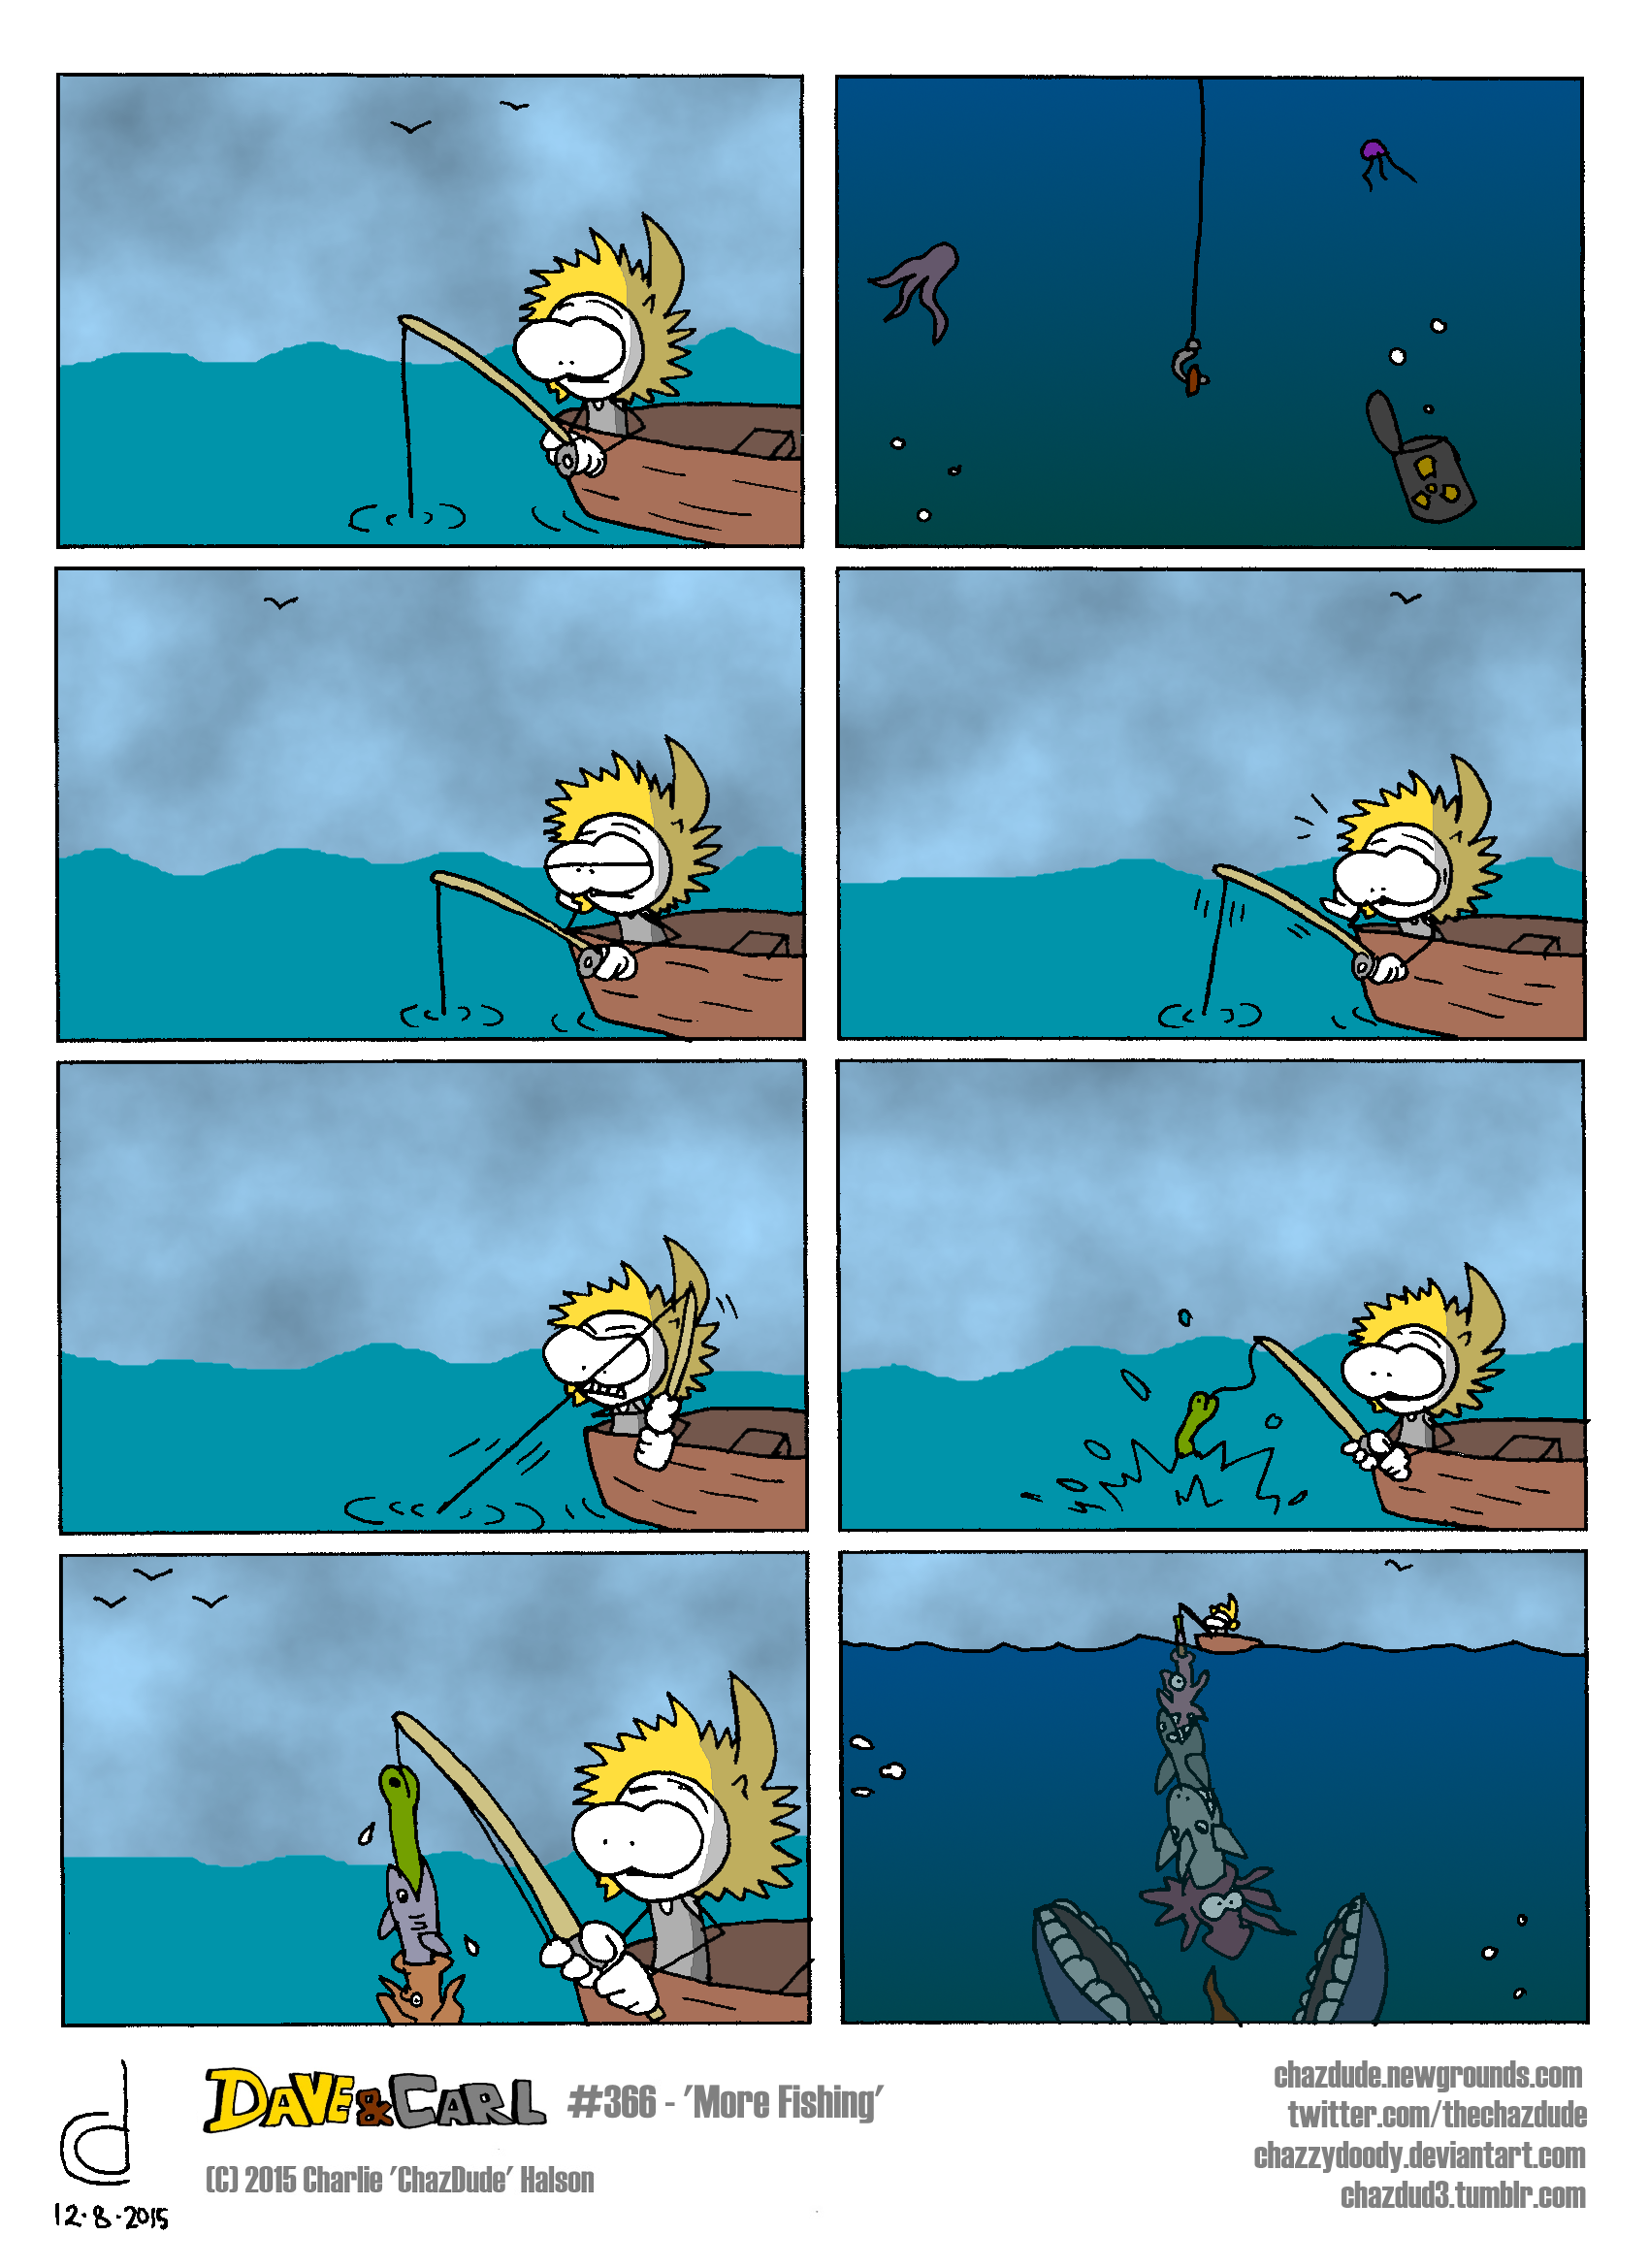 More Fishing